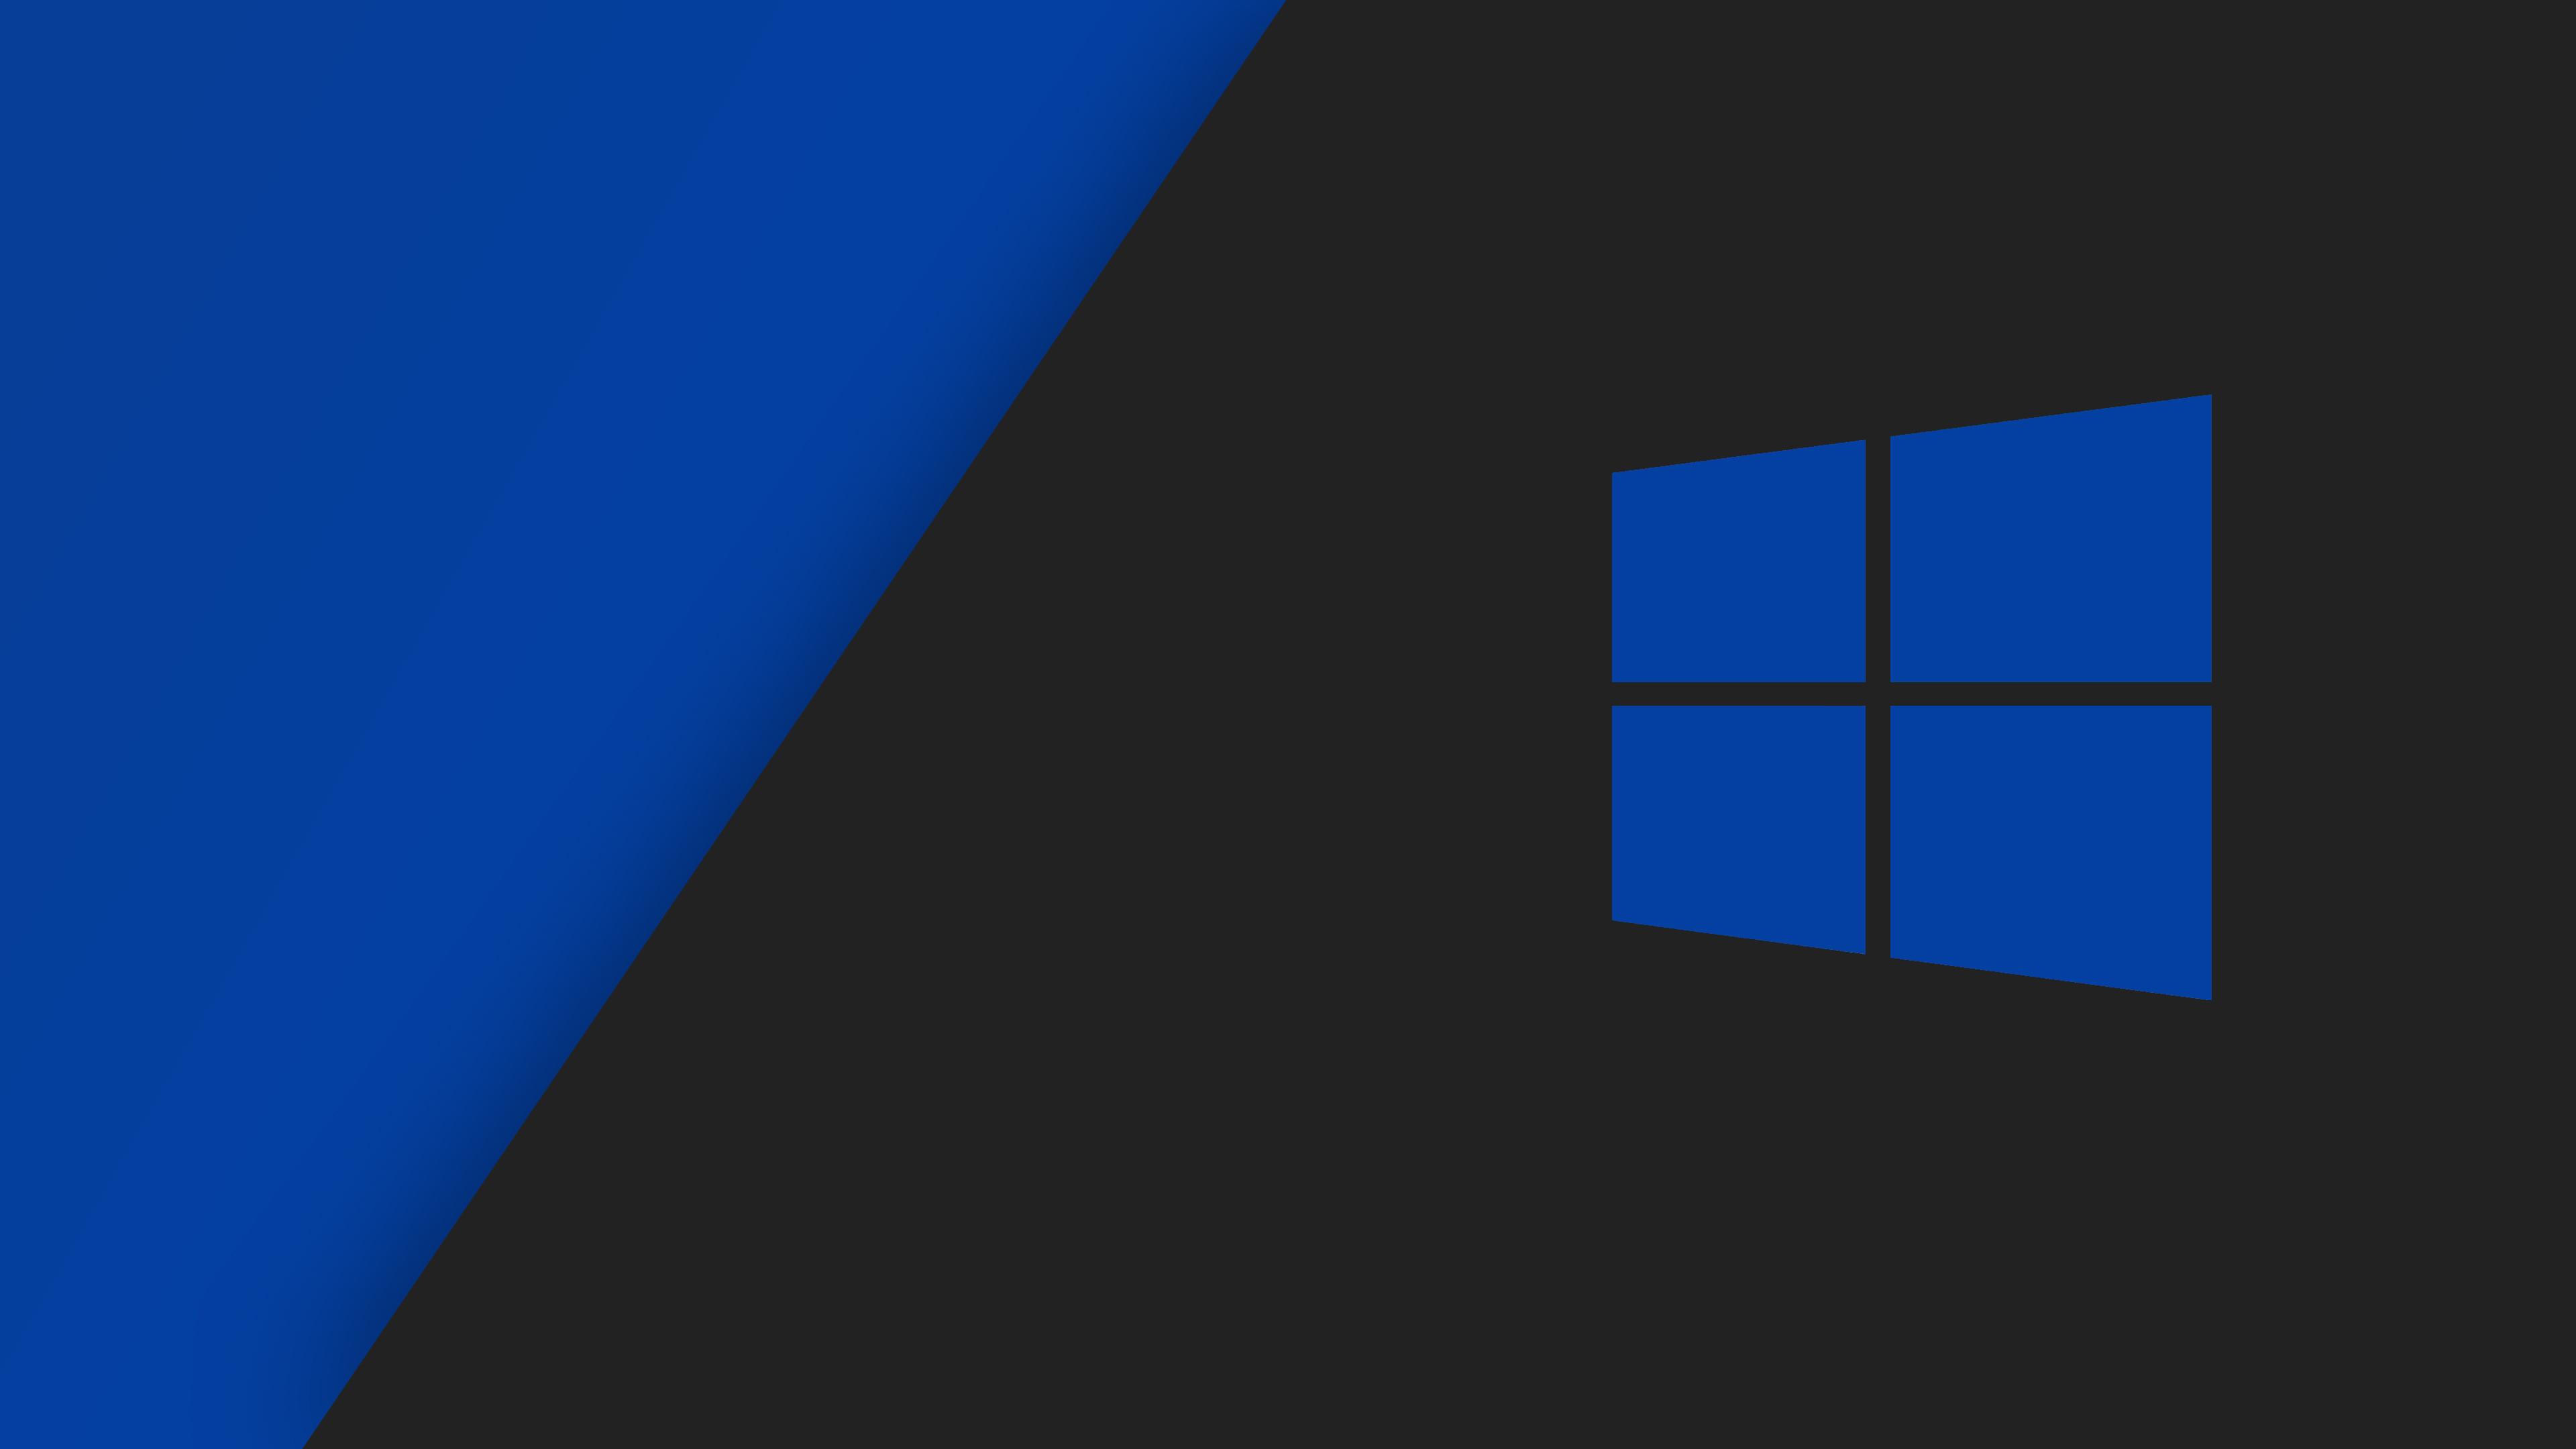 3840x2160 Windows 10 wallpapers